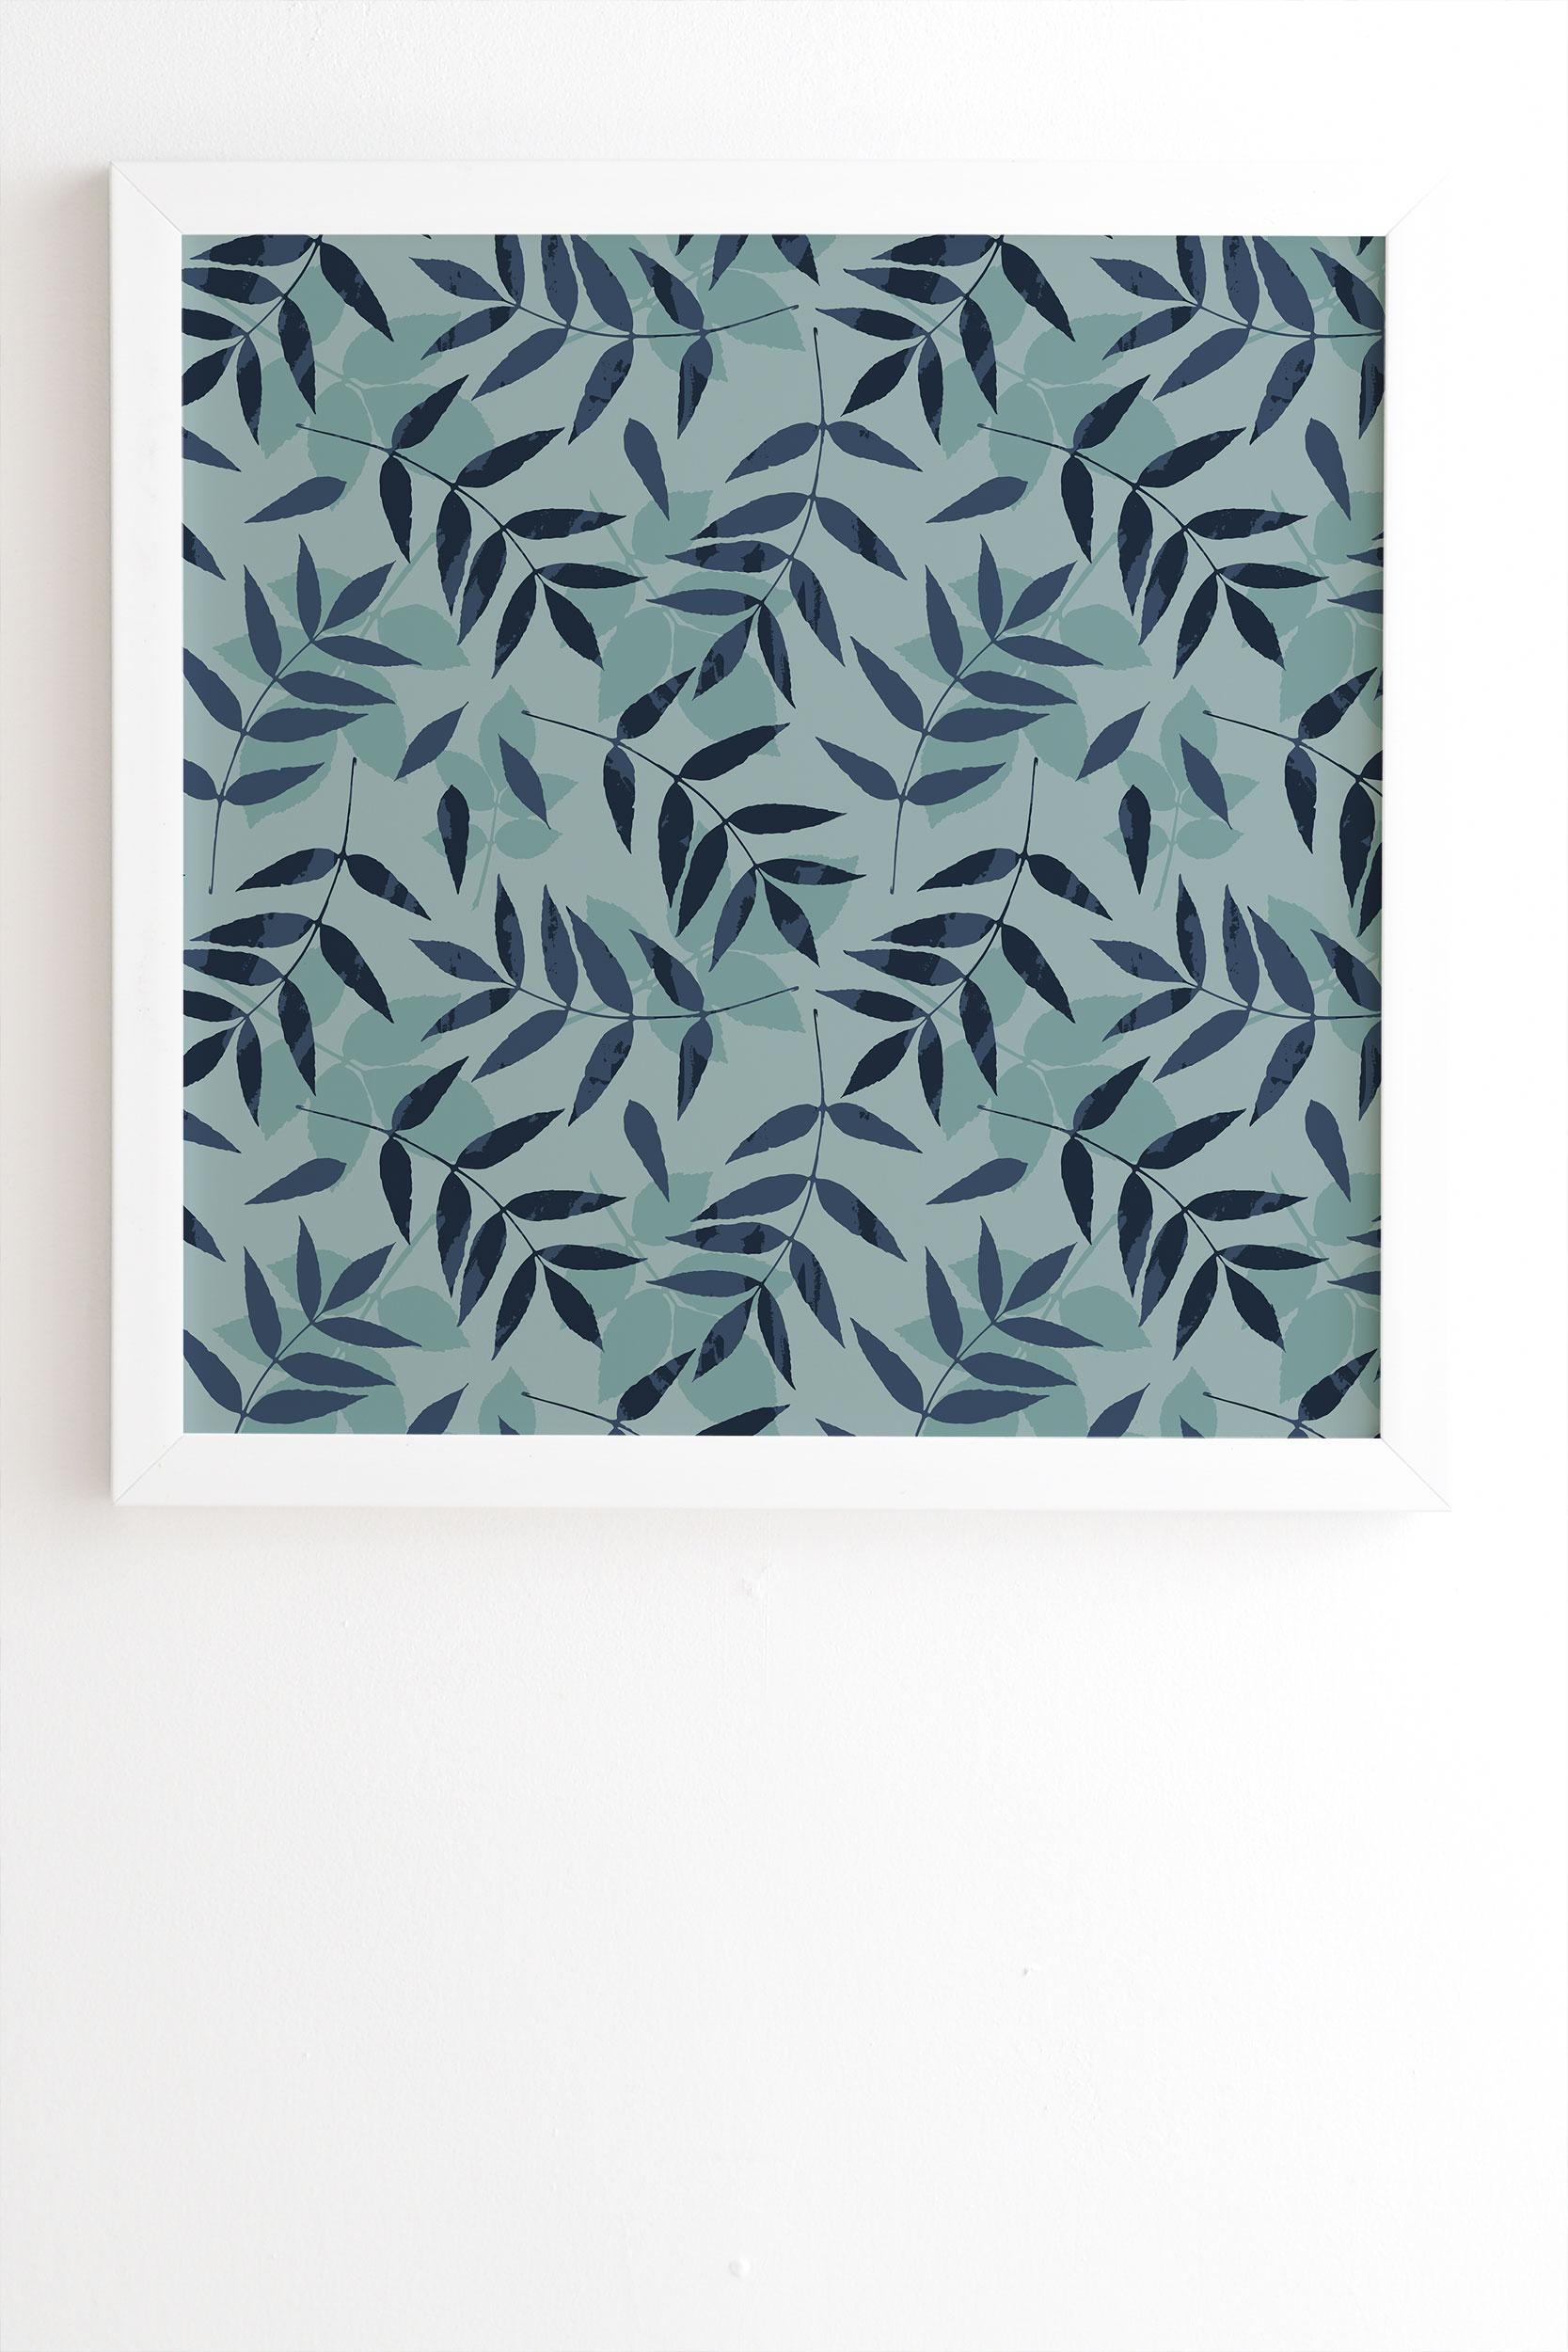 "Leaves Scattered 1 by Mareike Boehmer - Framed Wall Art Basic White 8"" x 9.5"""